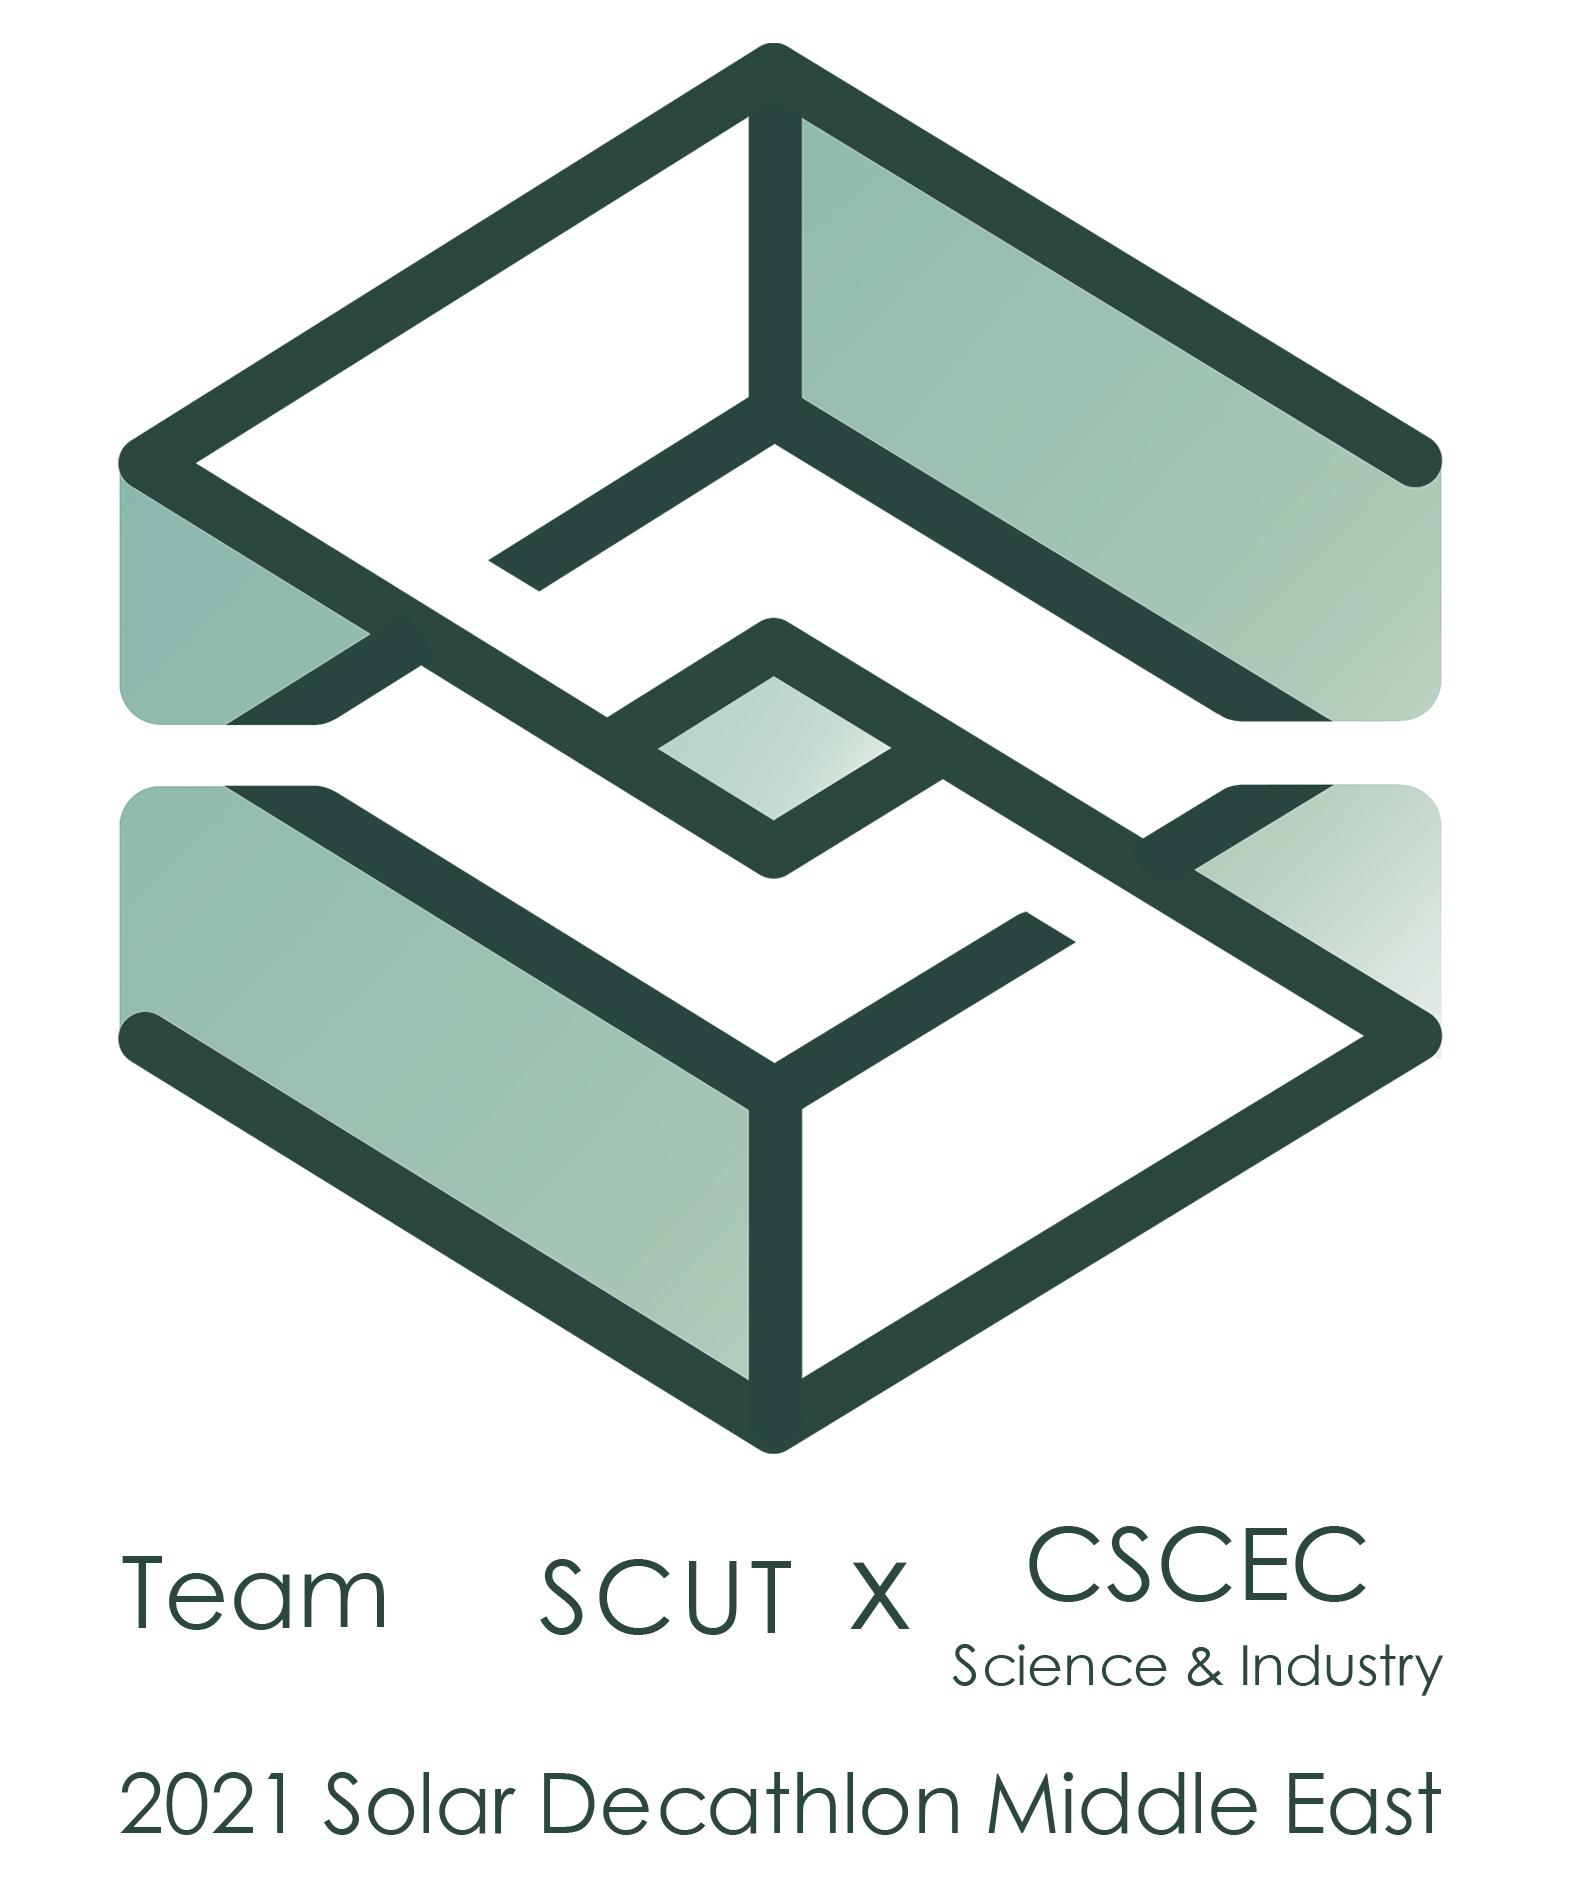 Team SCUTxCSCEC